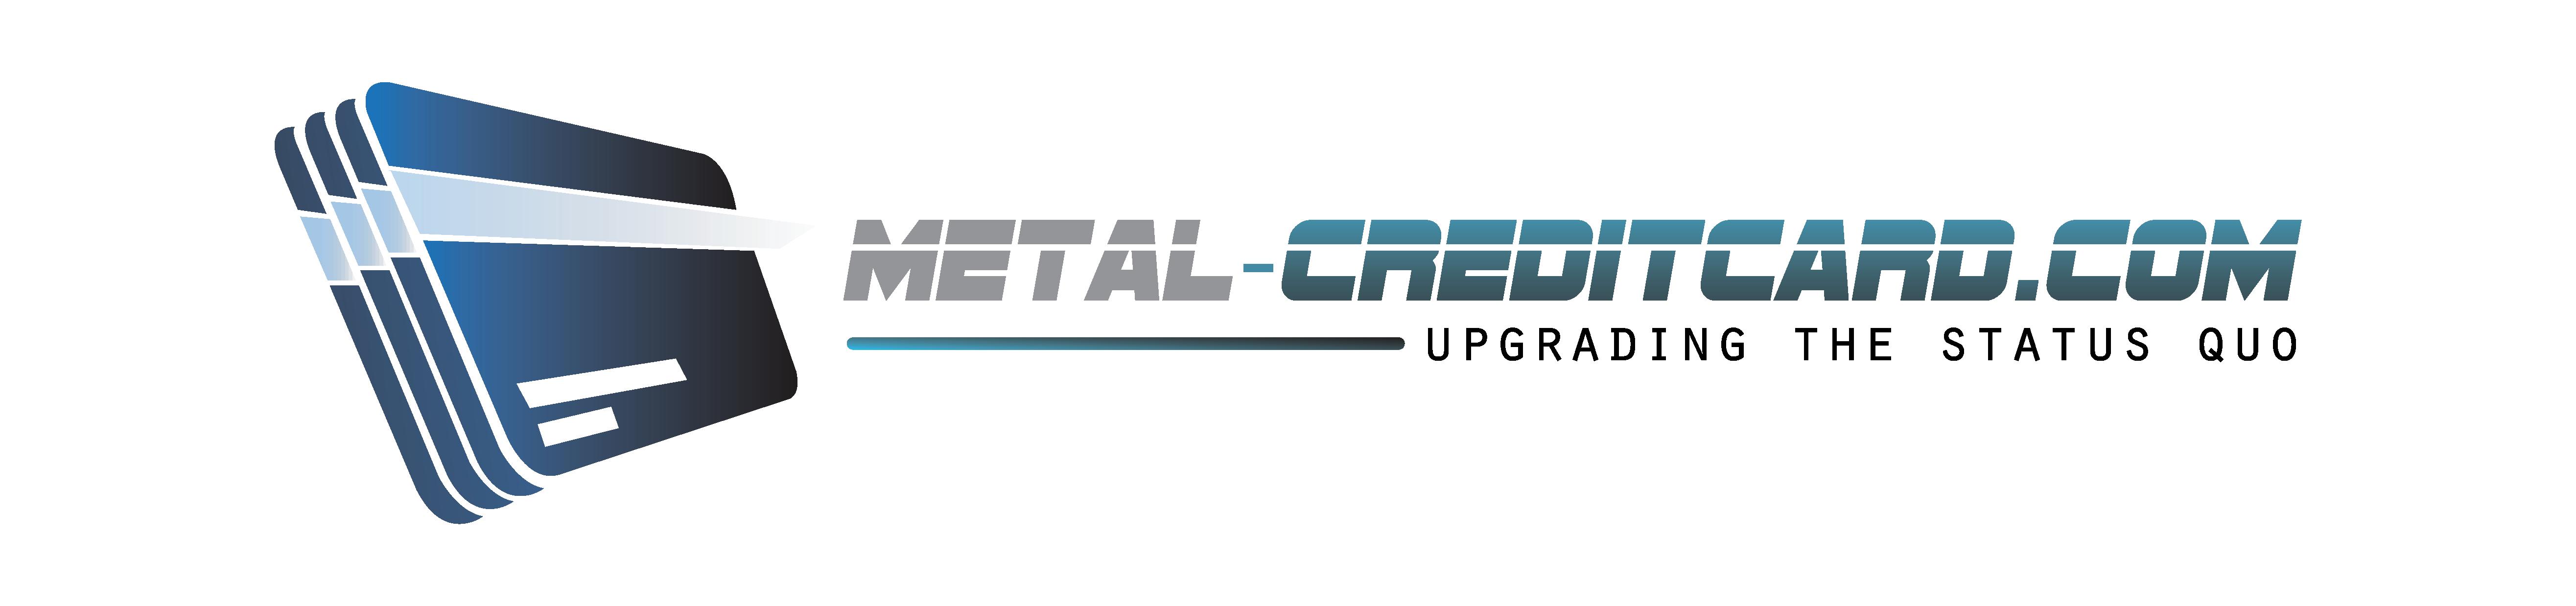 Metal-CreditCard.com™